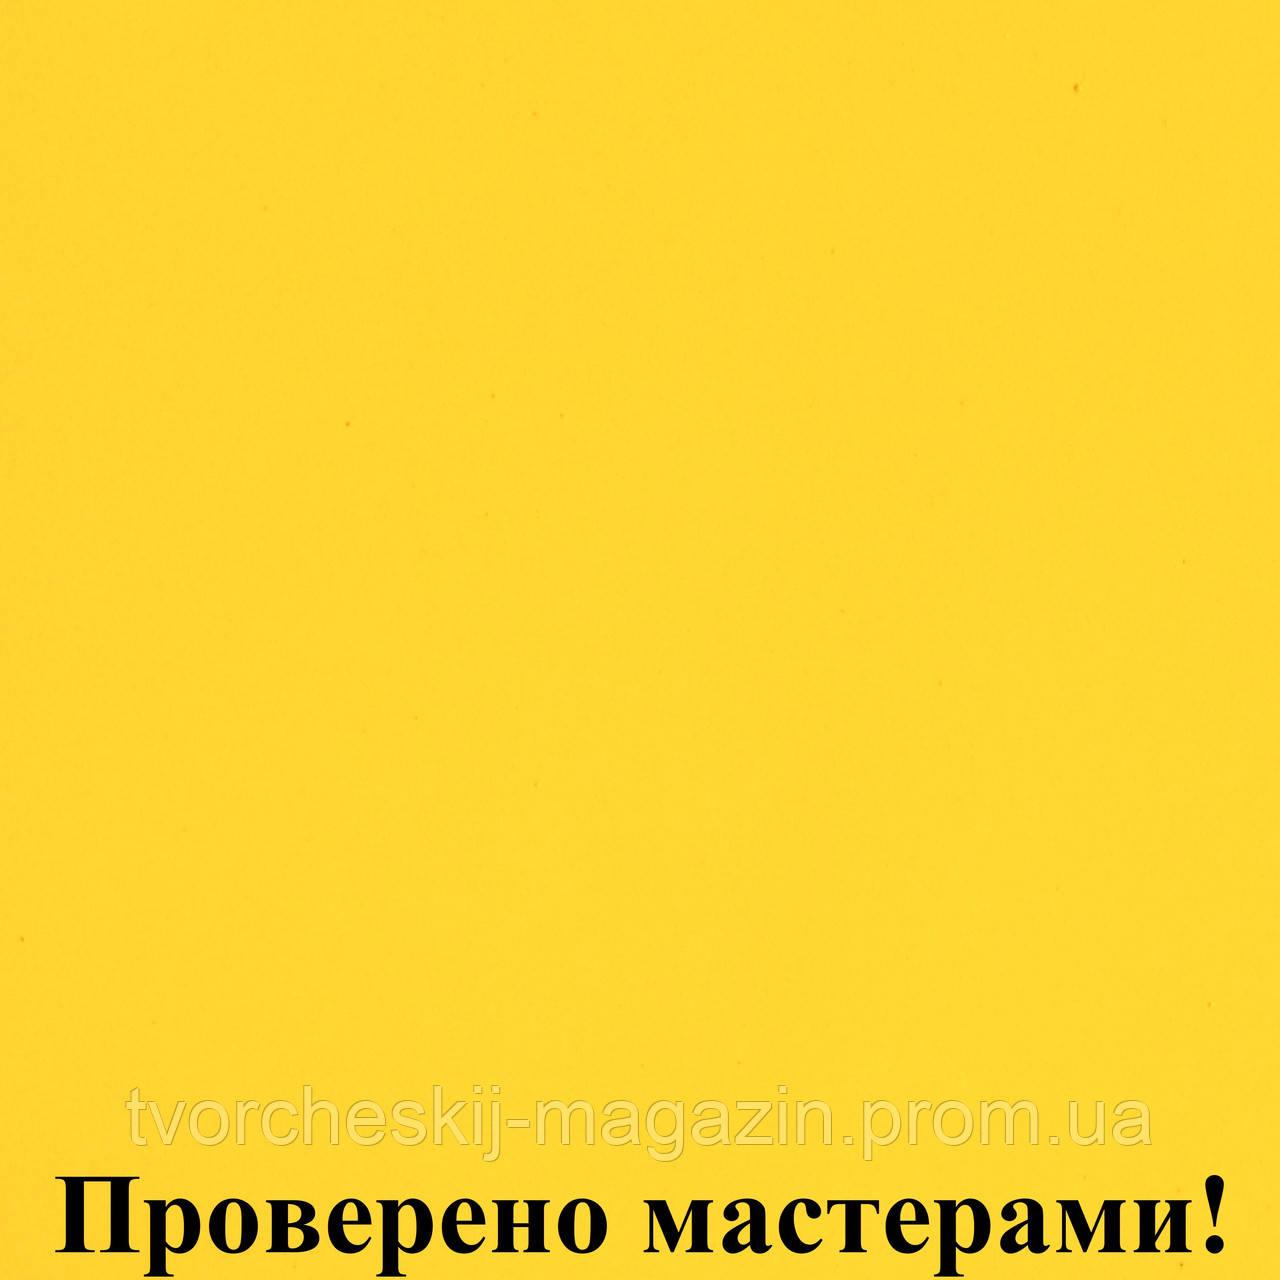 Фоамиран желтый китайский 1 мм 60 на 40 см (почти 4 листа А4)